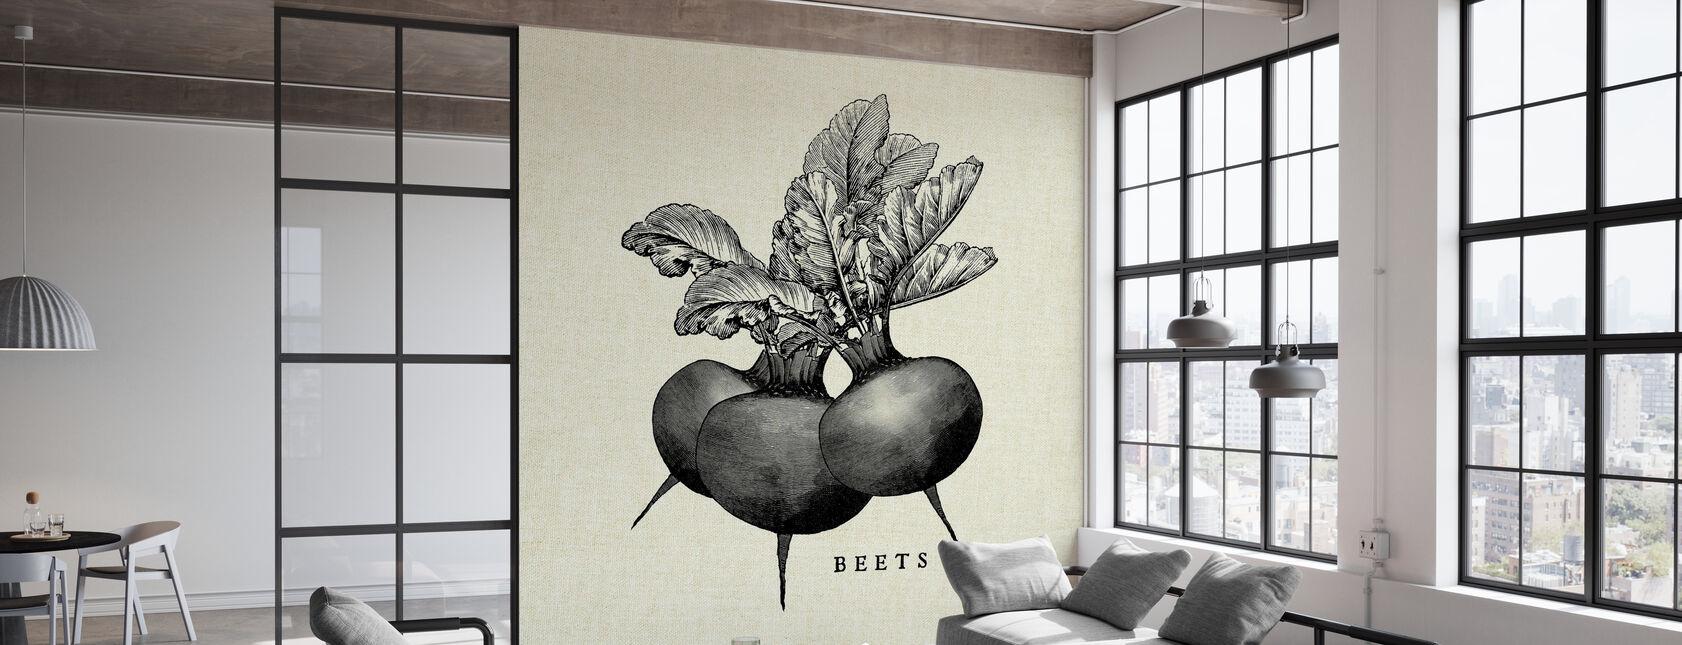 Kitchen Illustration - Beets - Wallpaper - Office